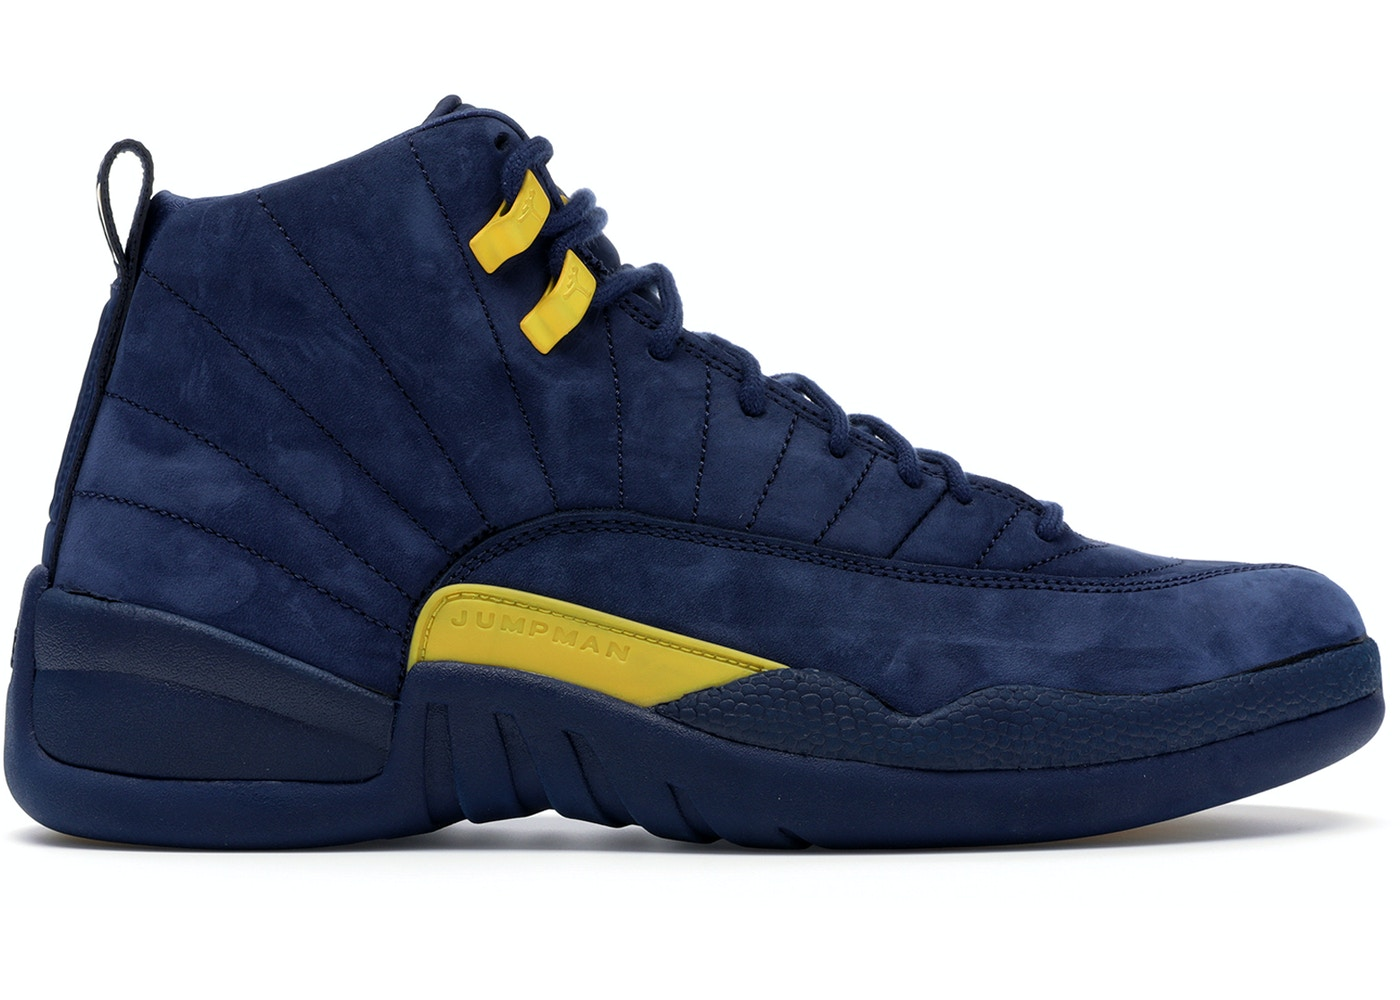 cheap for discount 12248 56e2e Buy Air Jordan 12 Shoes   Deadstock Sneakers